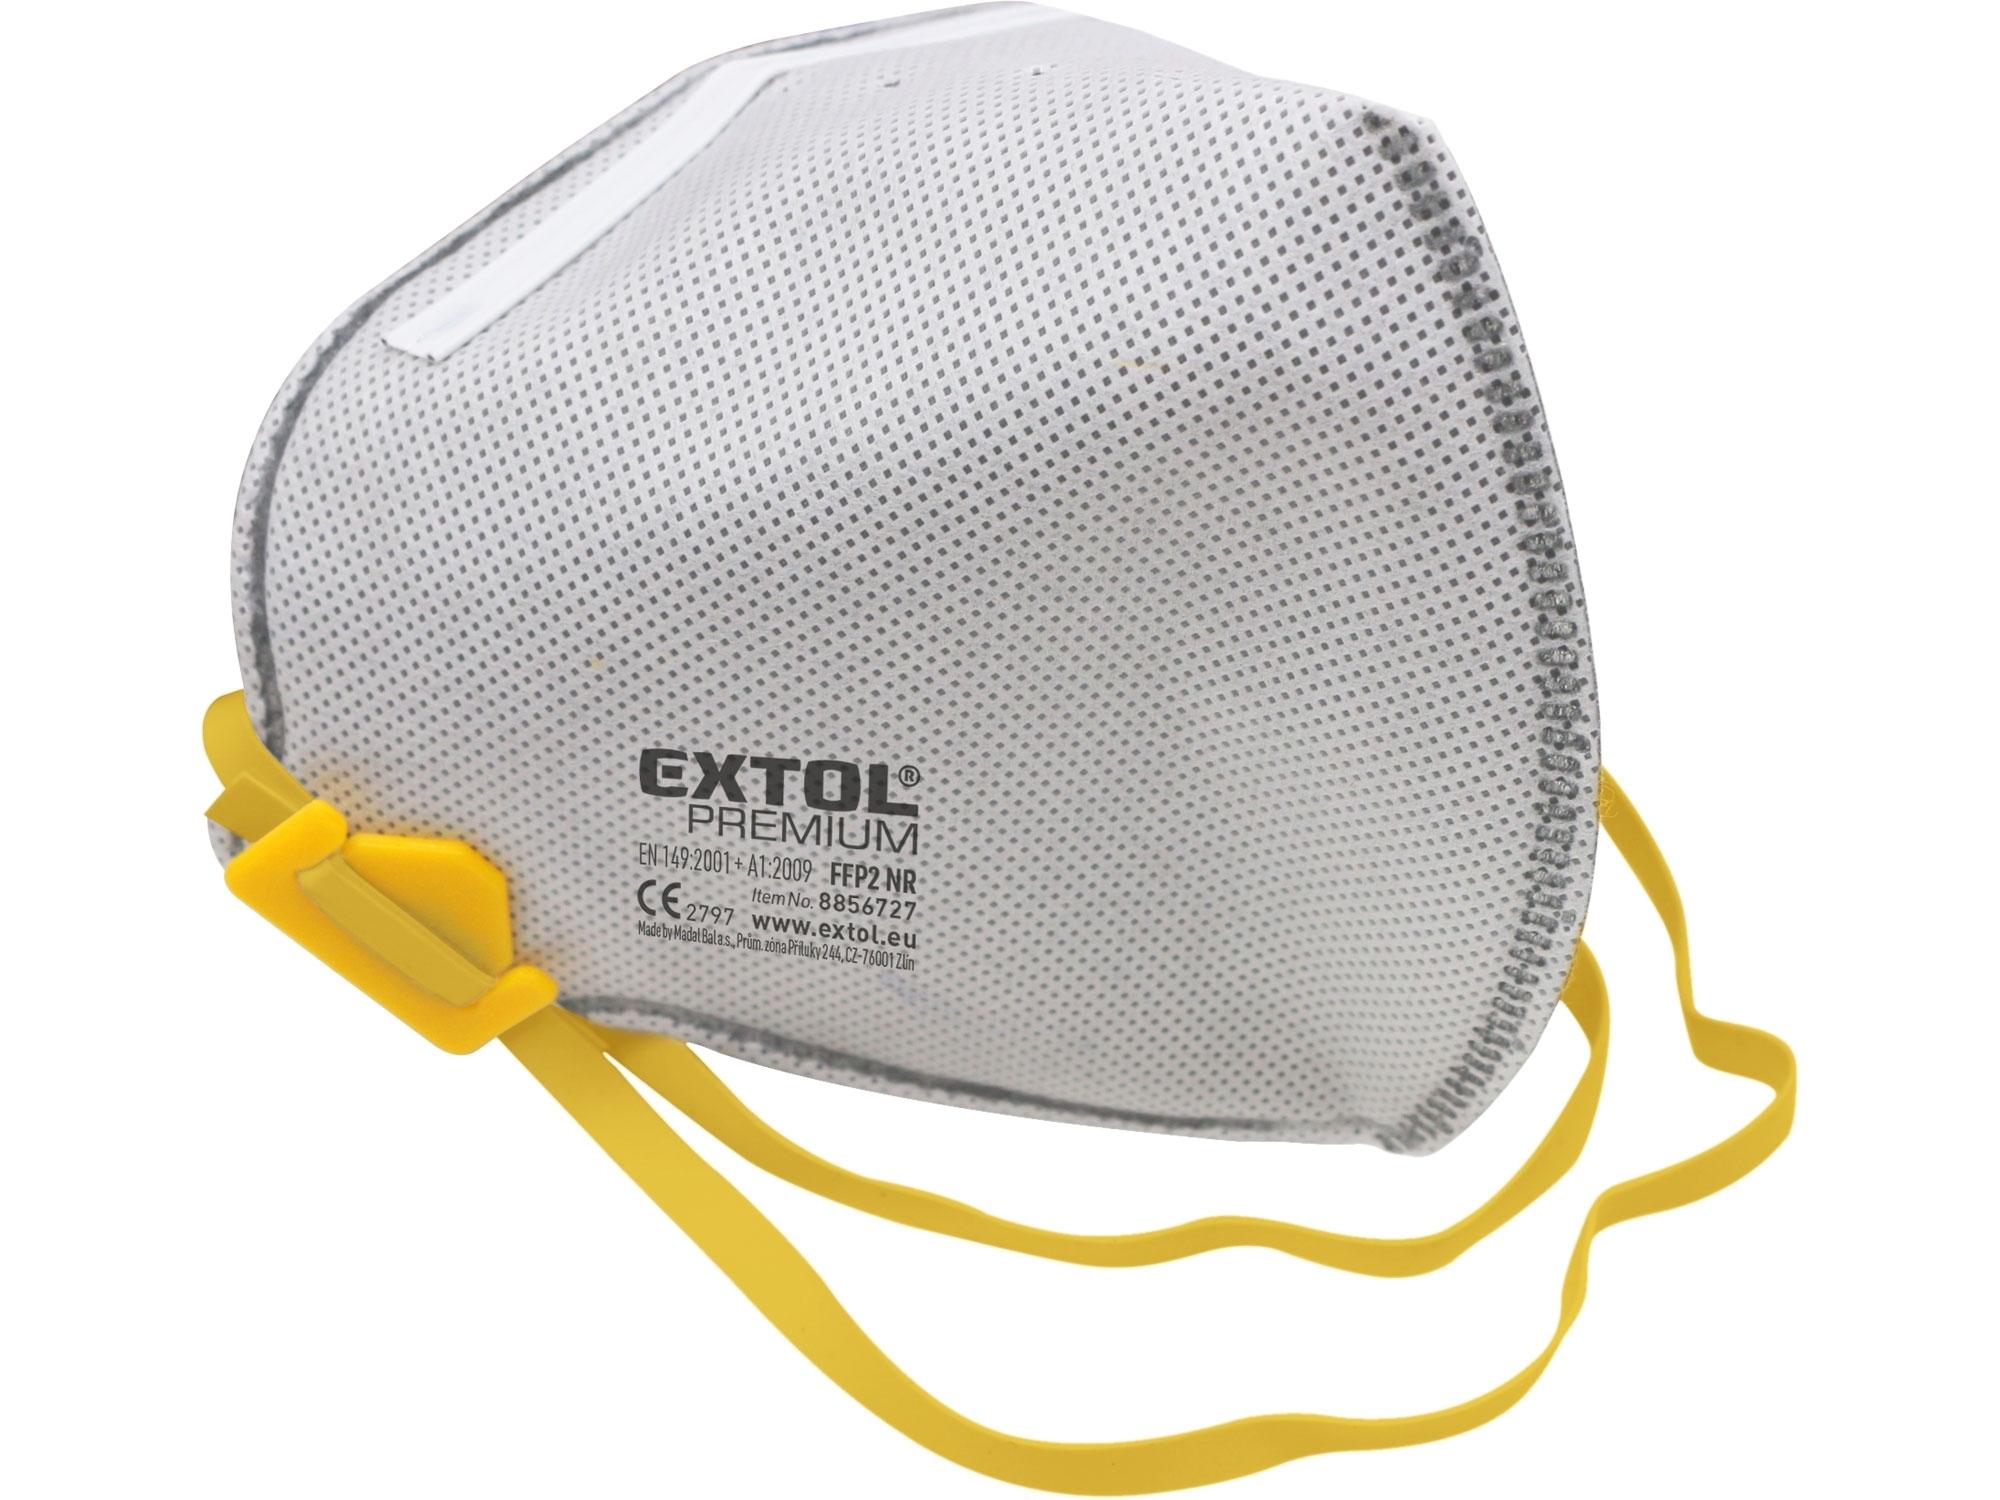 respirátory sada 3ks s aktivním uhlíkovým filtrem, třída FFP2 NR, skládací